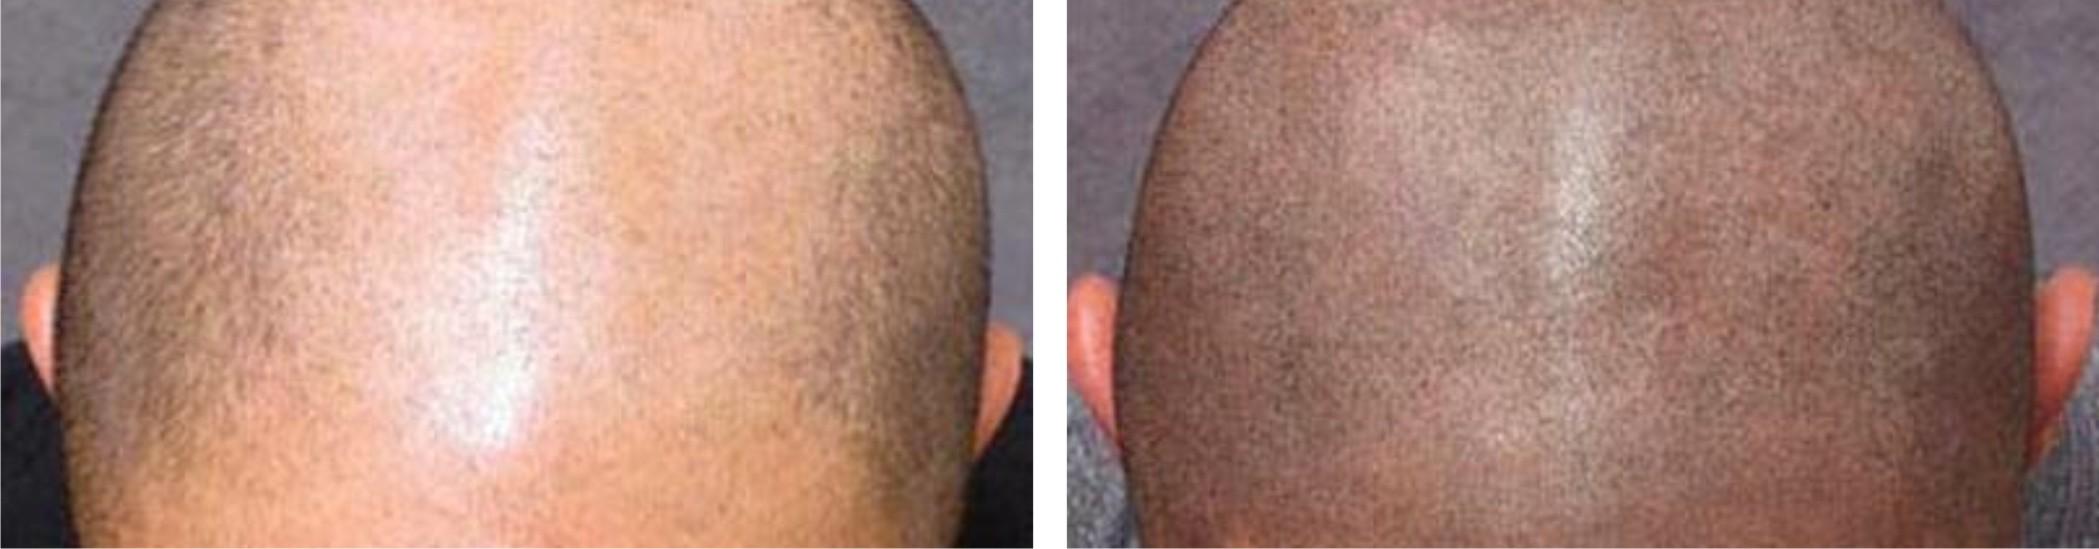 Hair Follicle Simulation Image Four